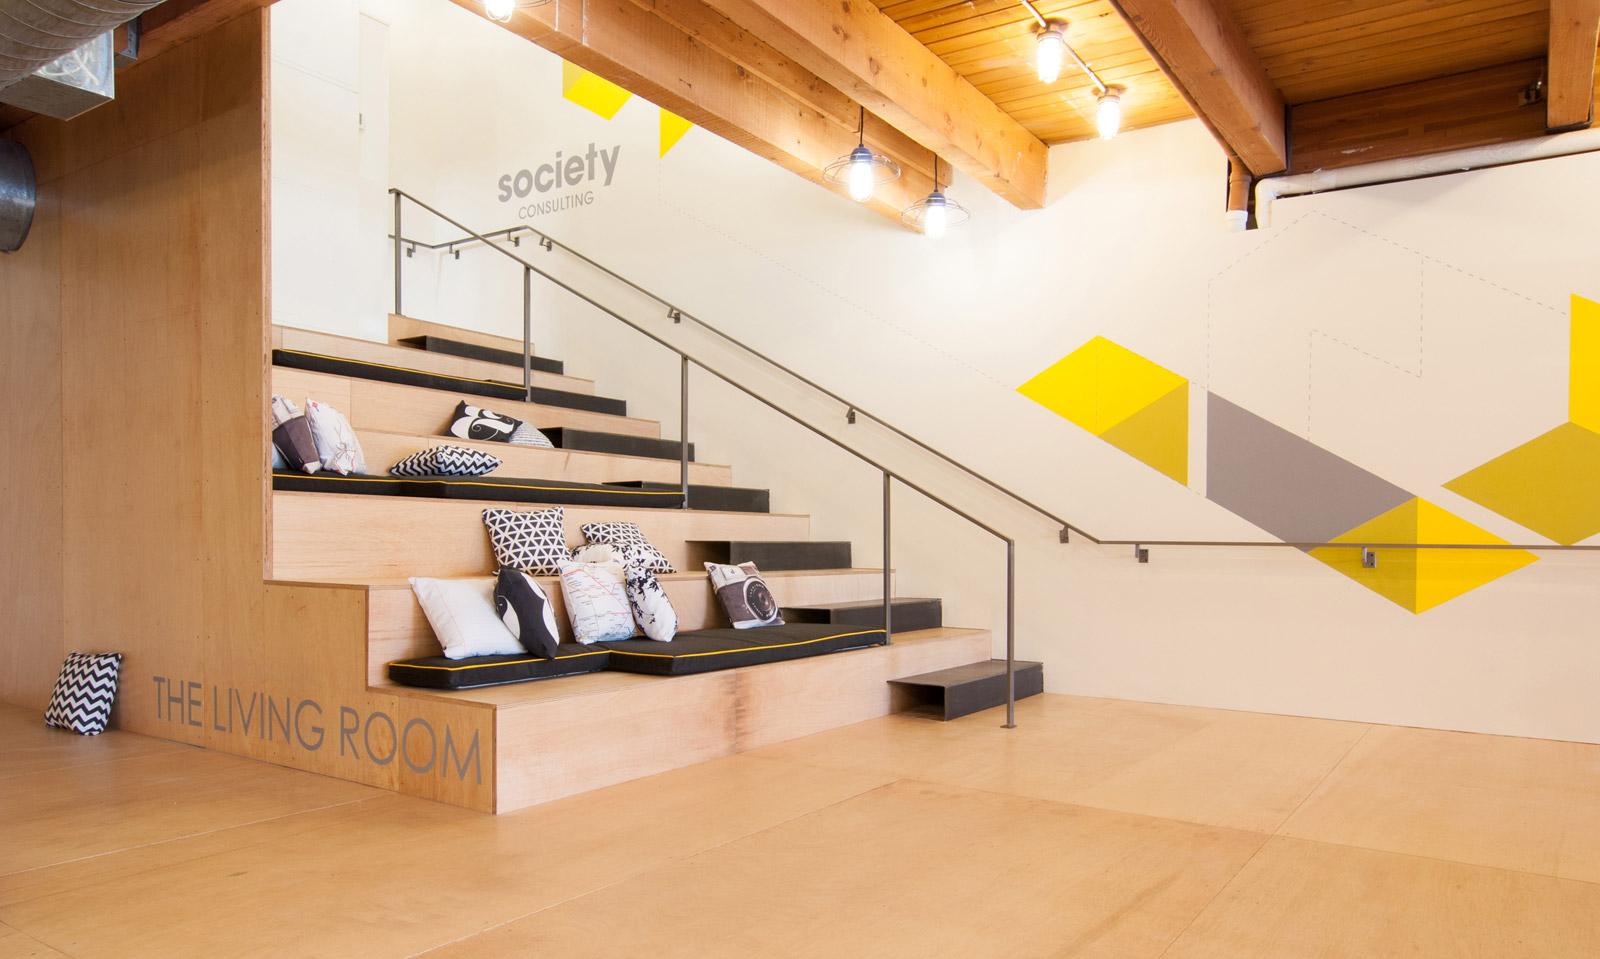 2_BUILD-LLC-Society-06#